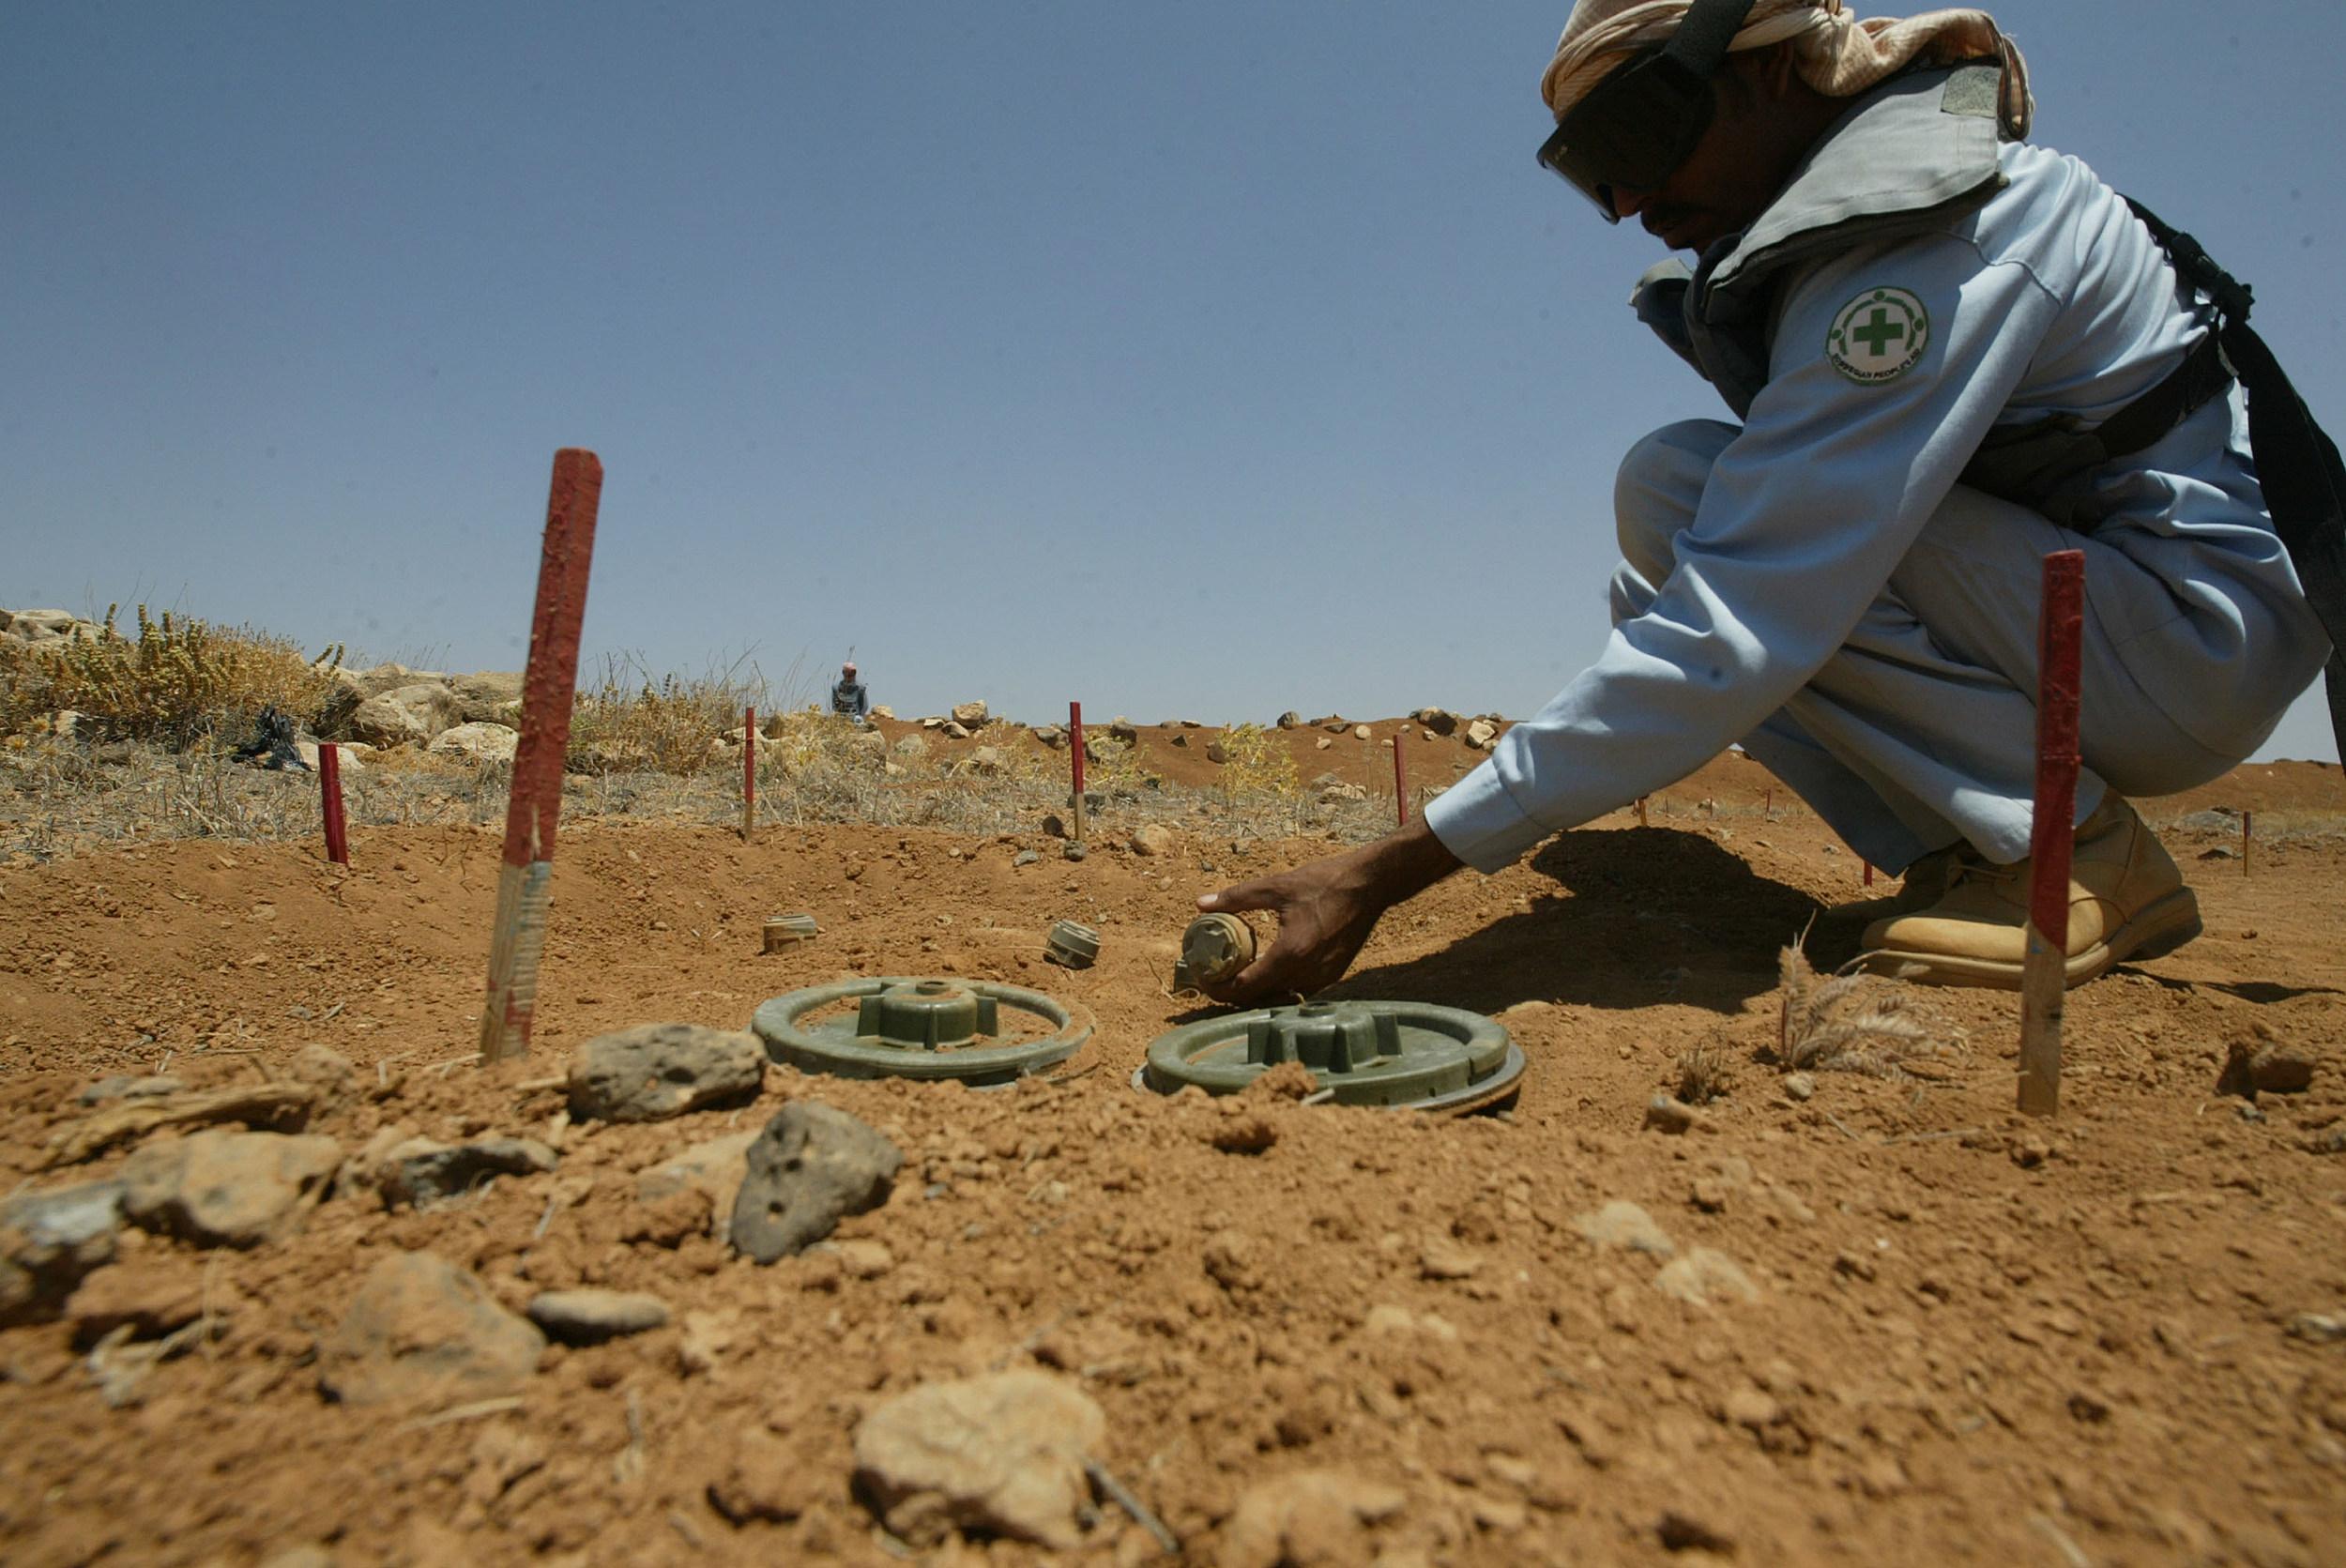 Ordnance Experts Demine Syrian Border Area